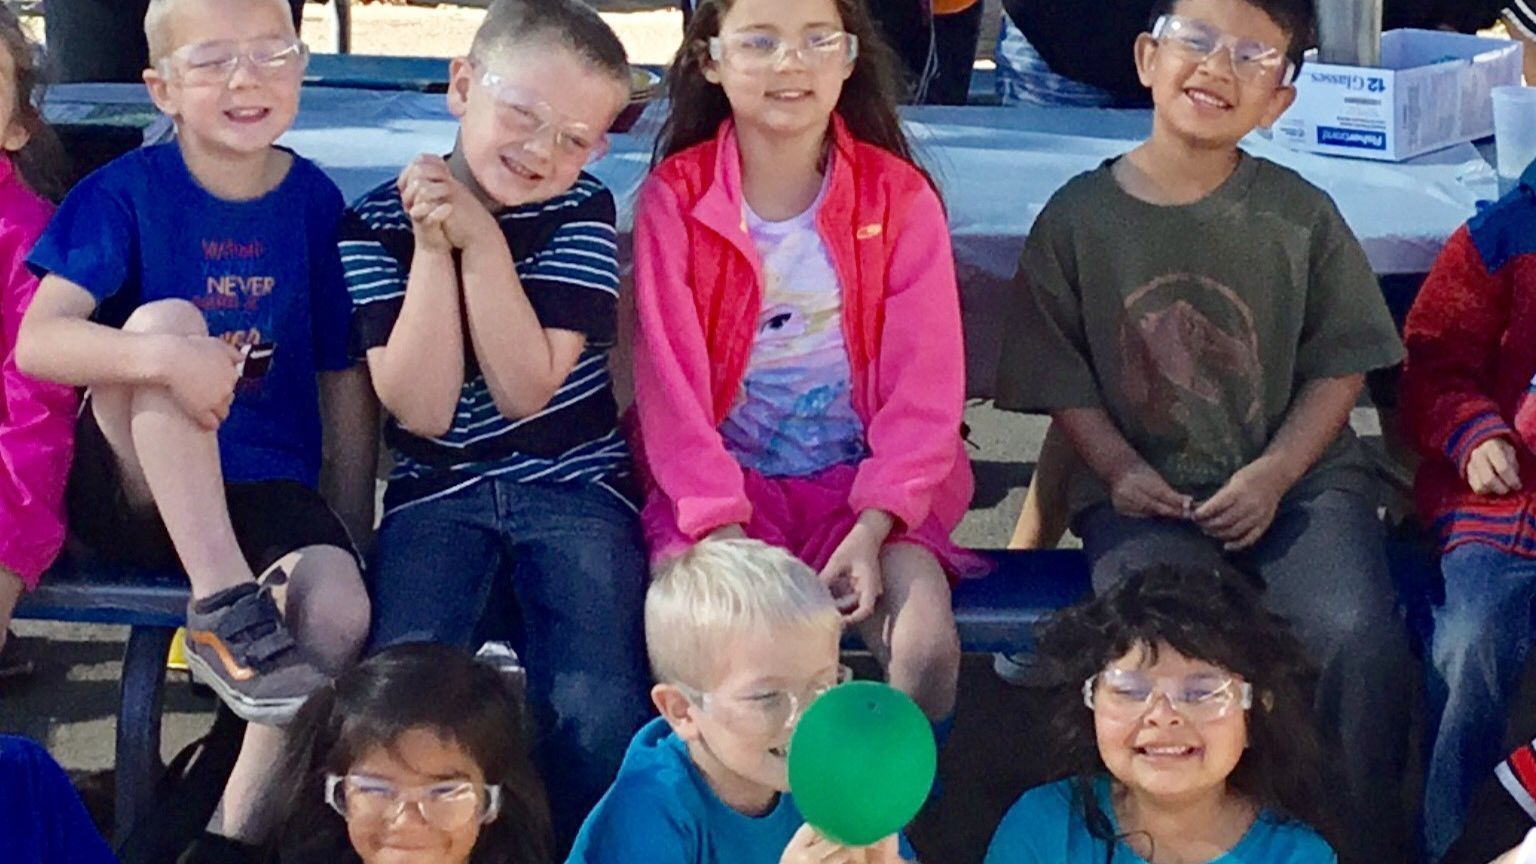 Ramona High School students participating in the Femineer Program teach science experiments to Ramona Elementary School kindergartners.